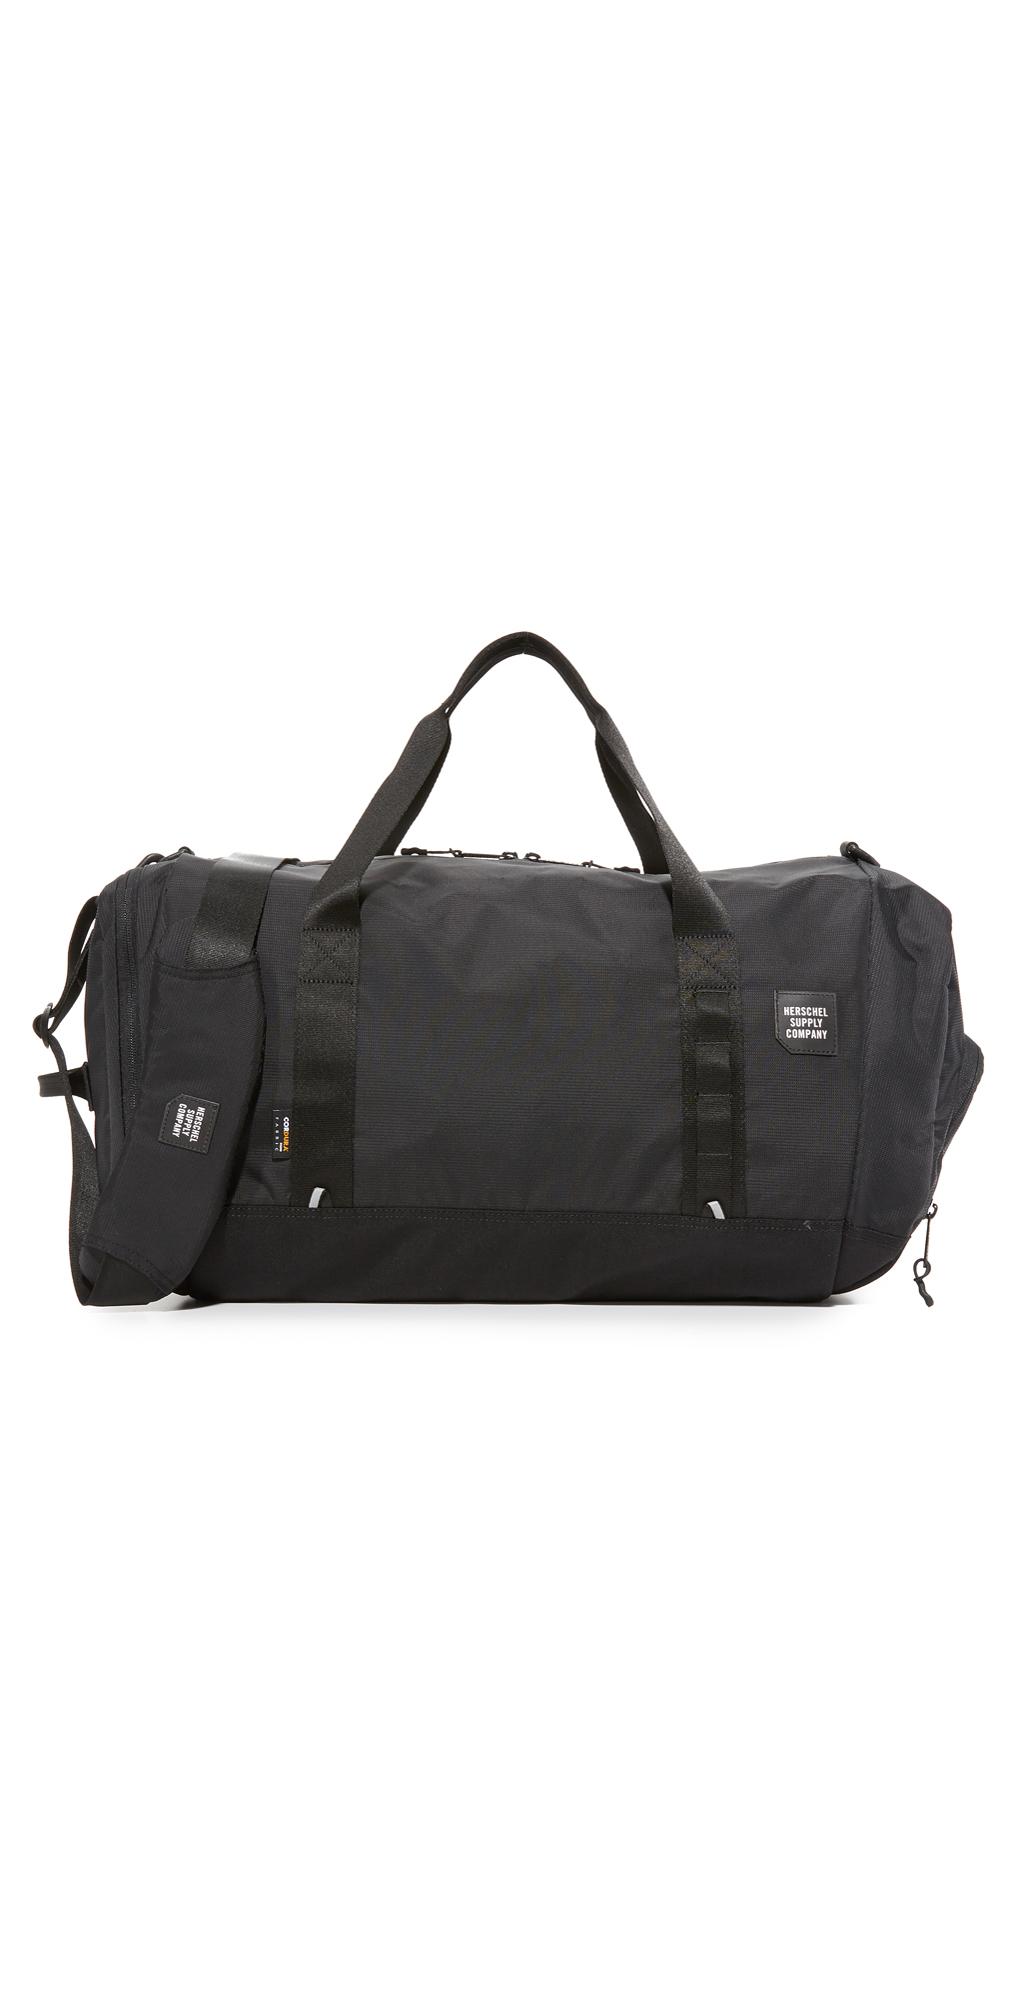 Gorge Duffel Bag Herschel Supply Co.